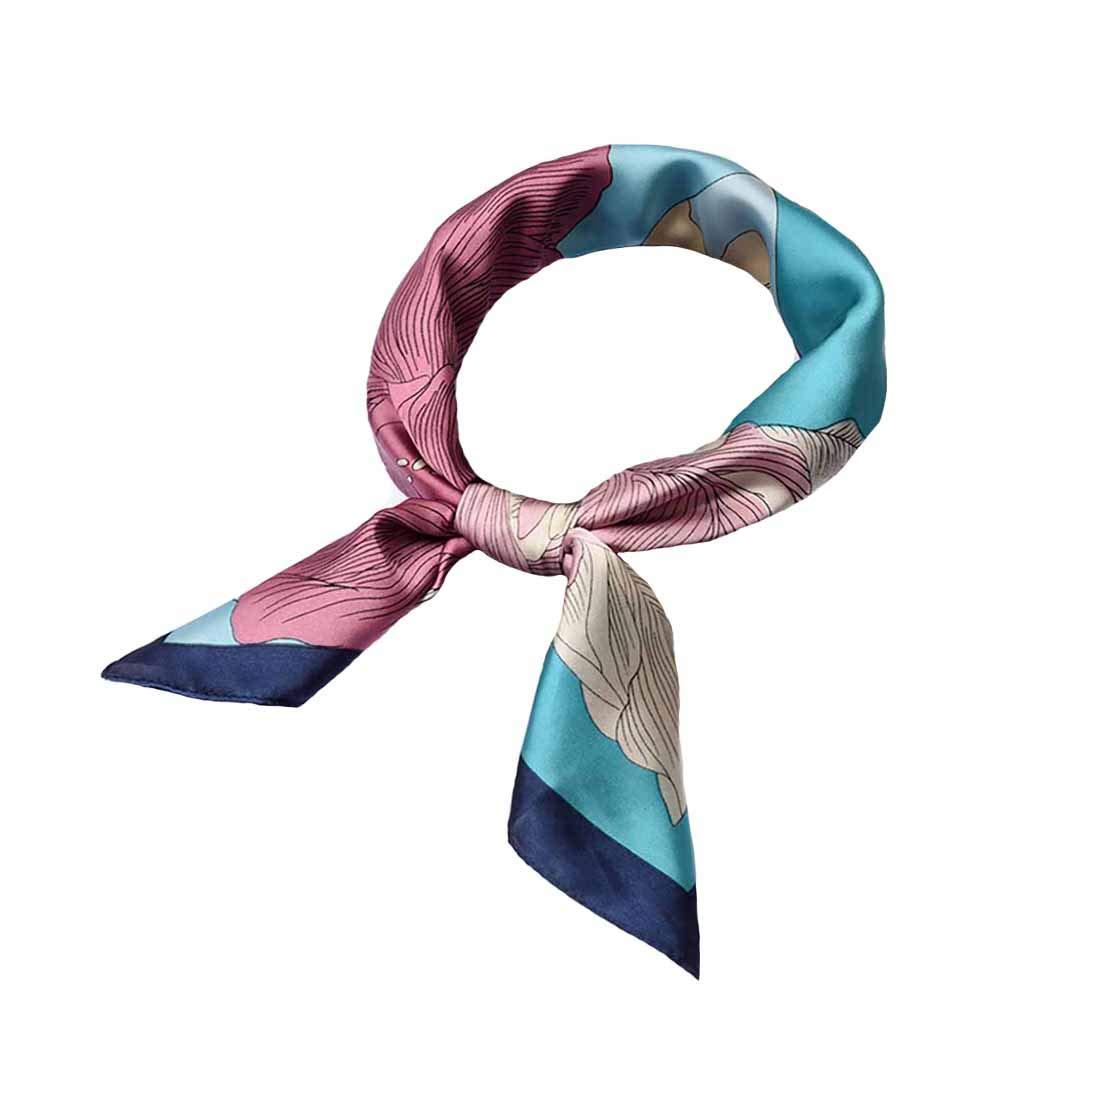 Silk Scarf Square Satin Headscarf Women's Fashion Scarfs Neckerchief Neck Tie (190#)